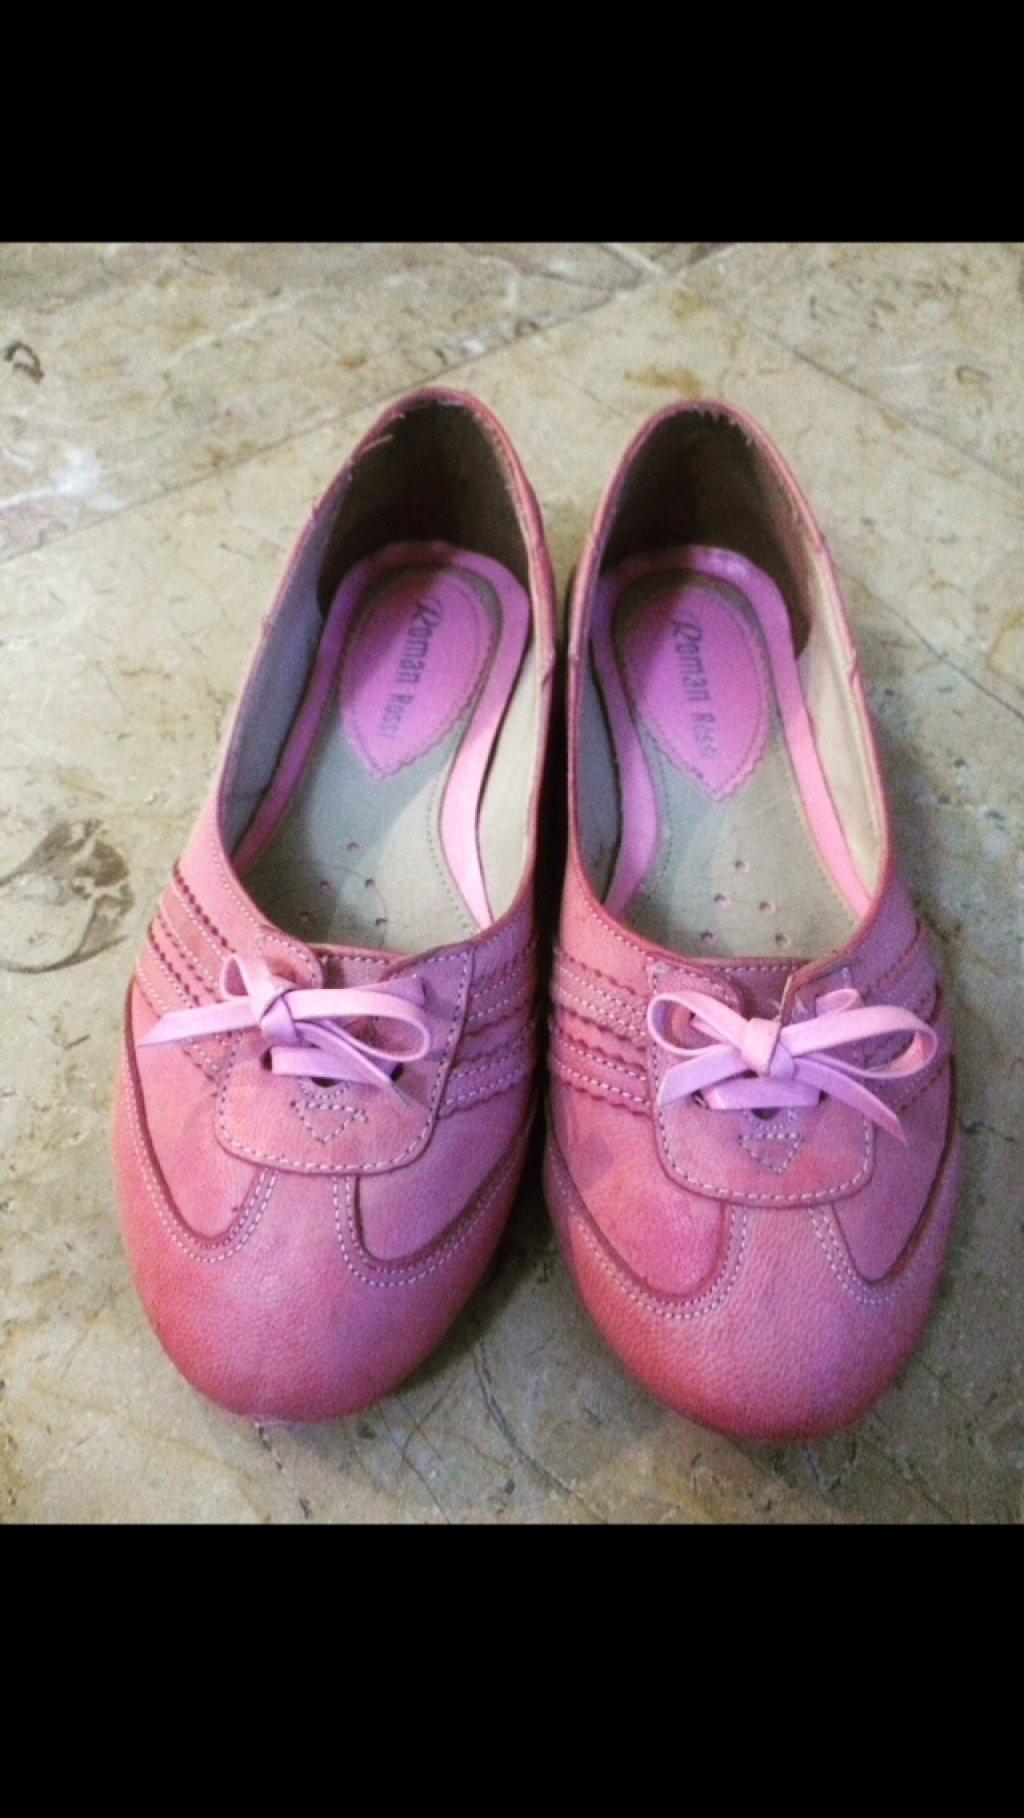 کفش عروسکى سایز ٣٦/٣٧